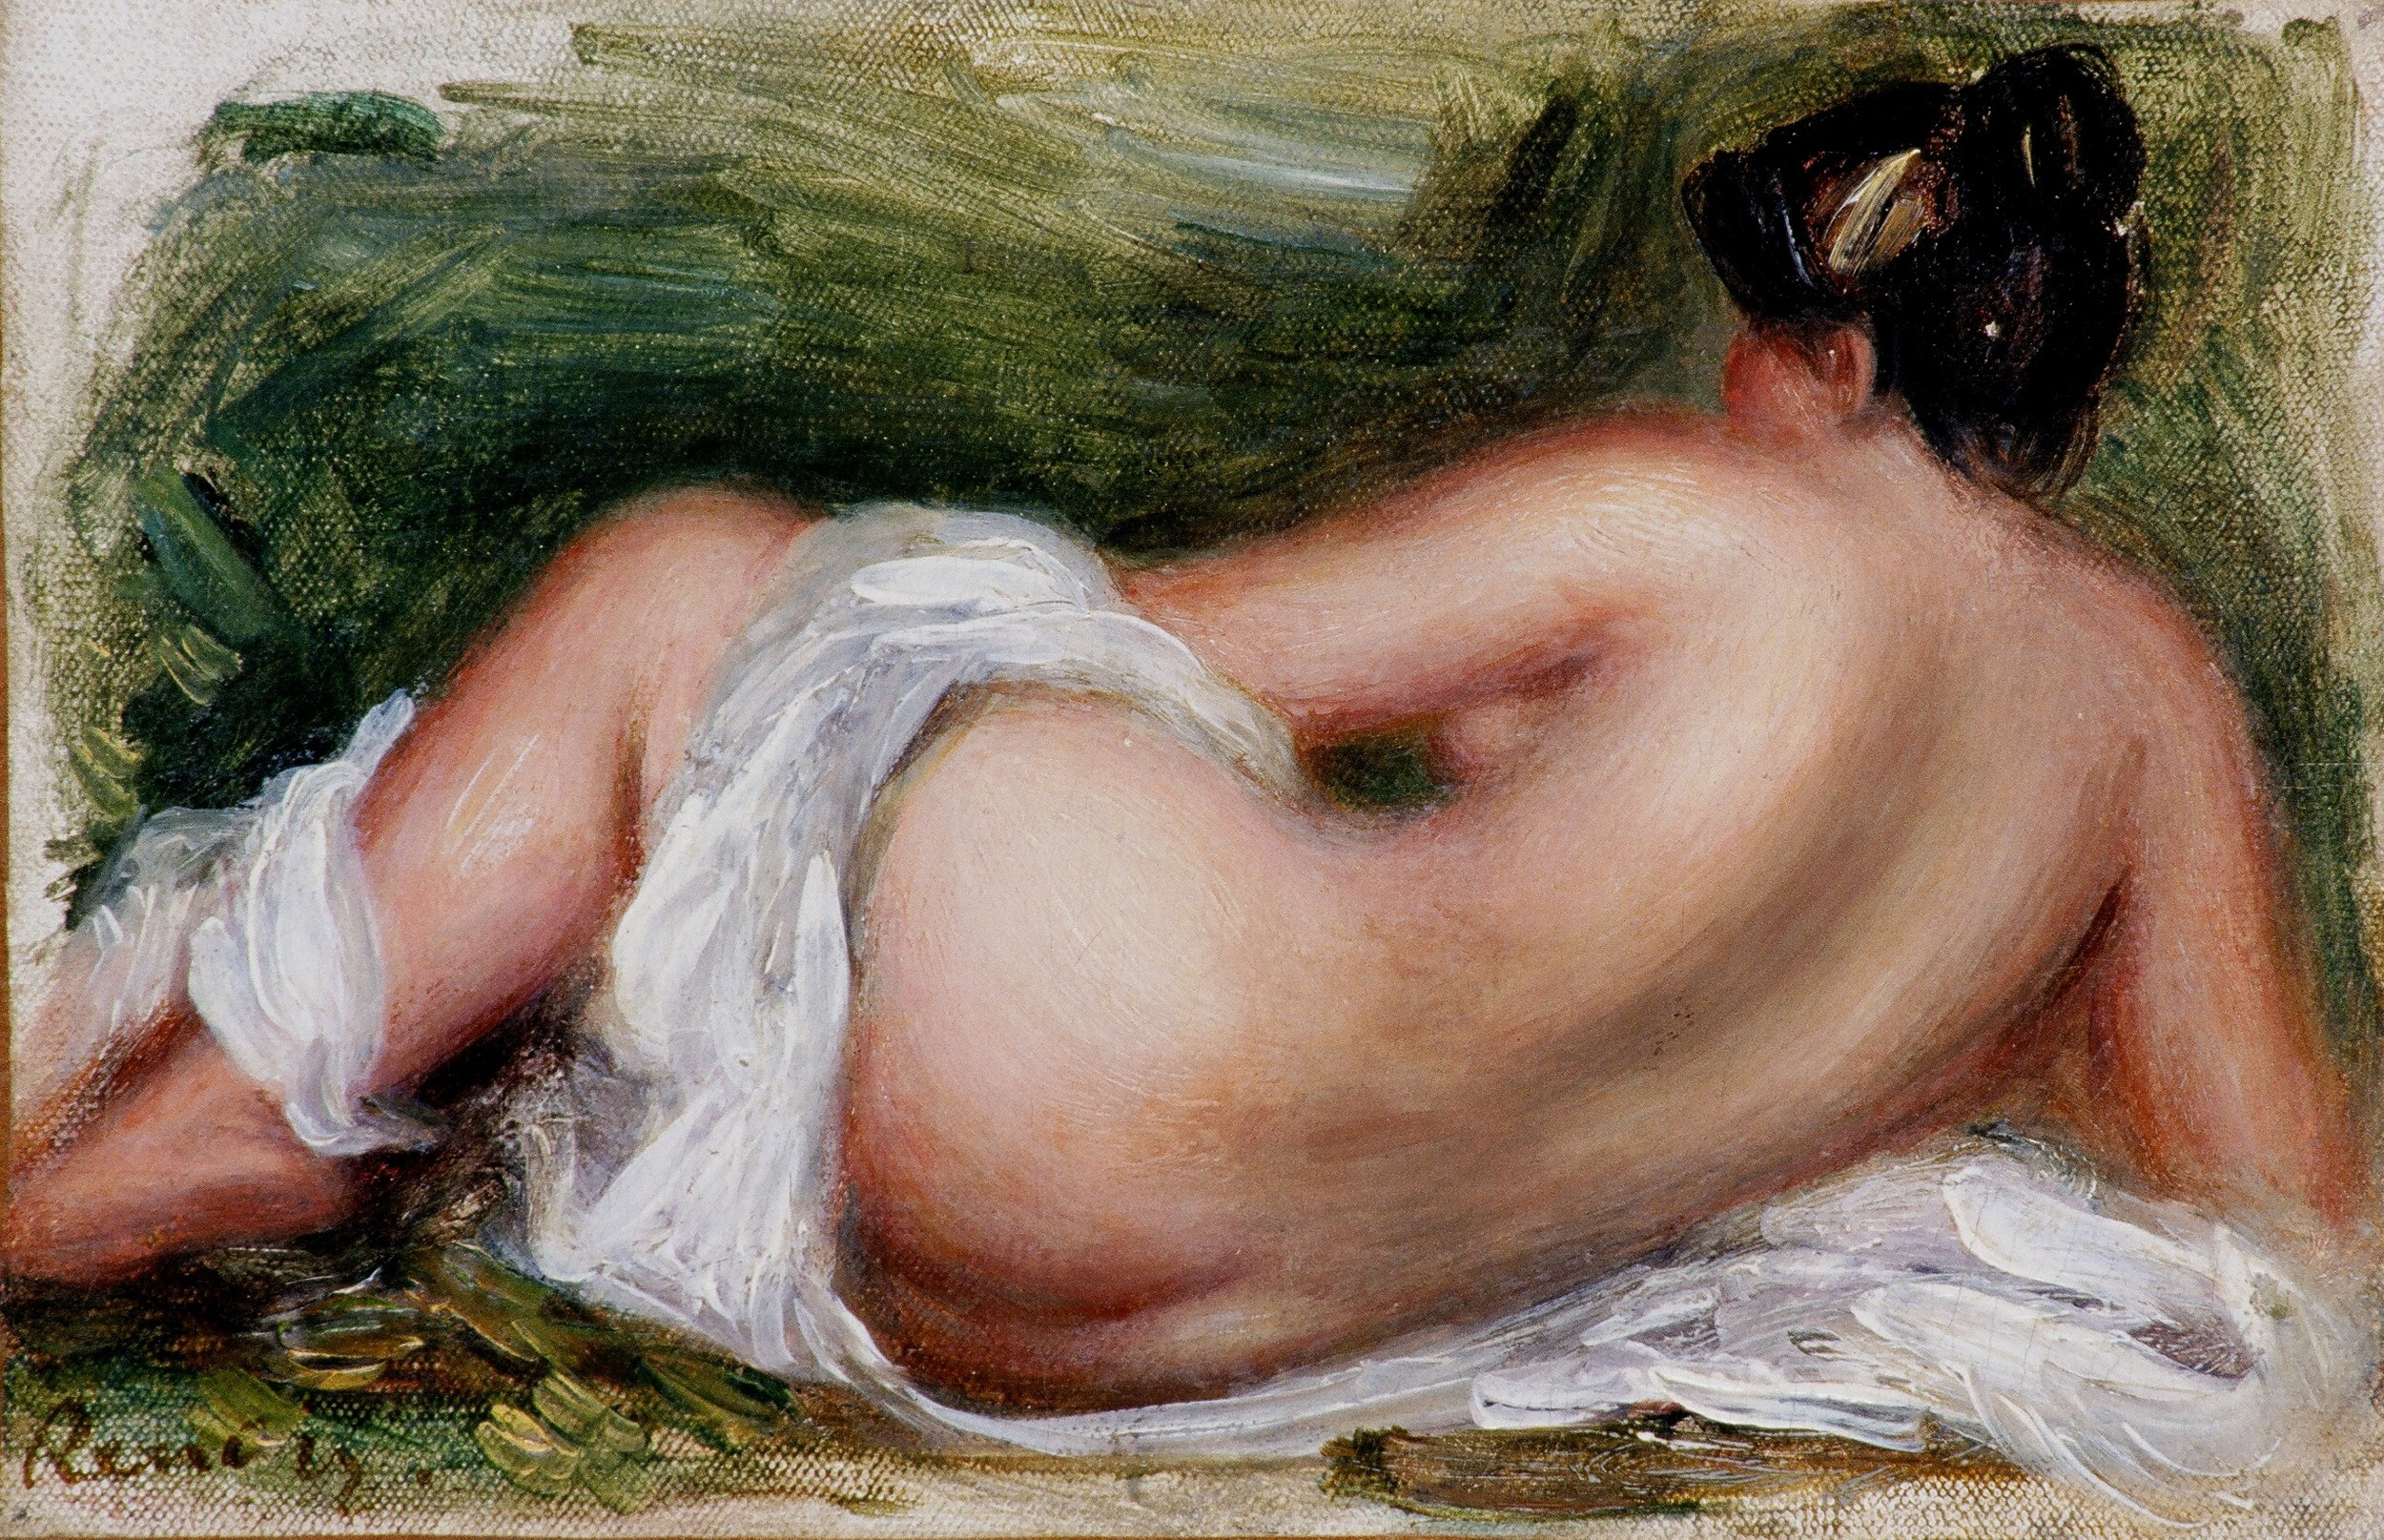 Nu Couché, vu de dos (Reclining Nude from Back), c. 1893